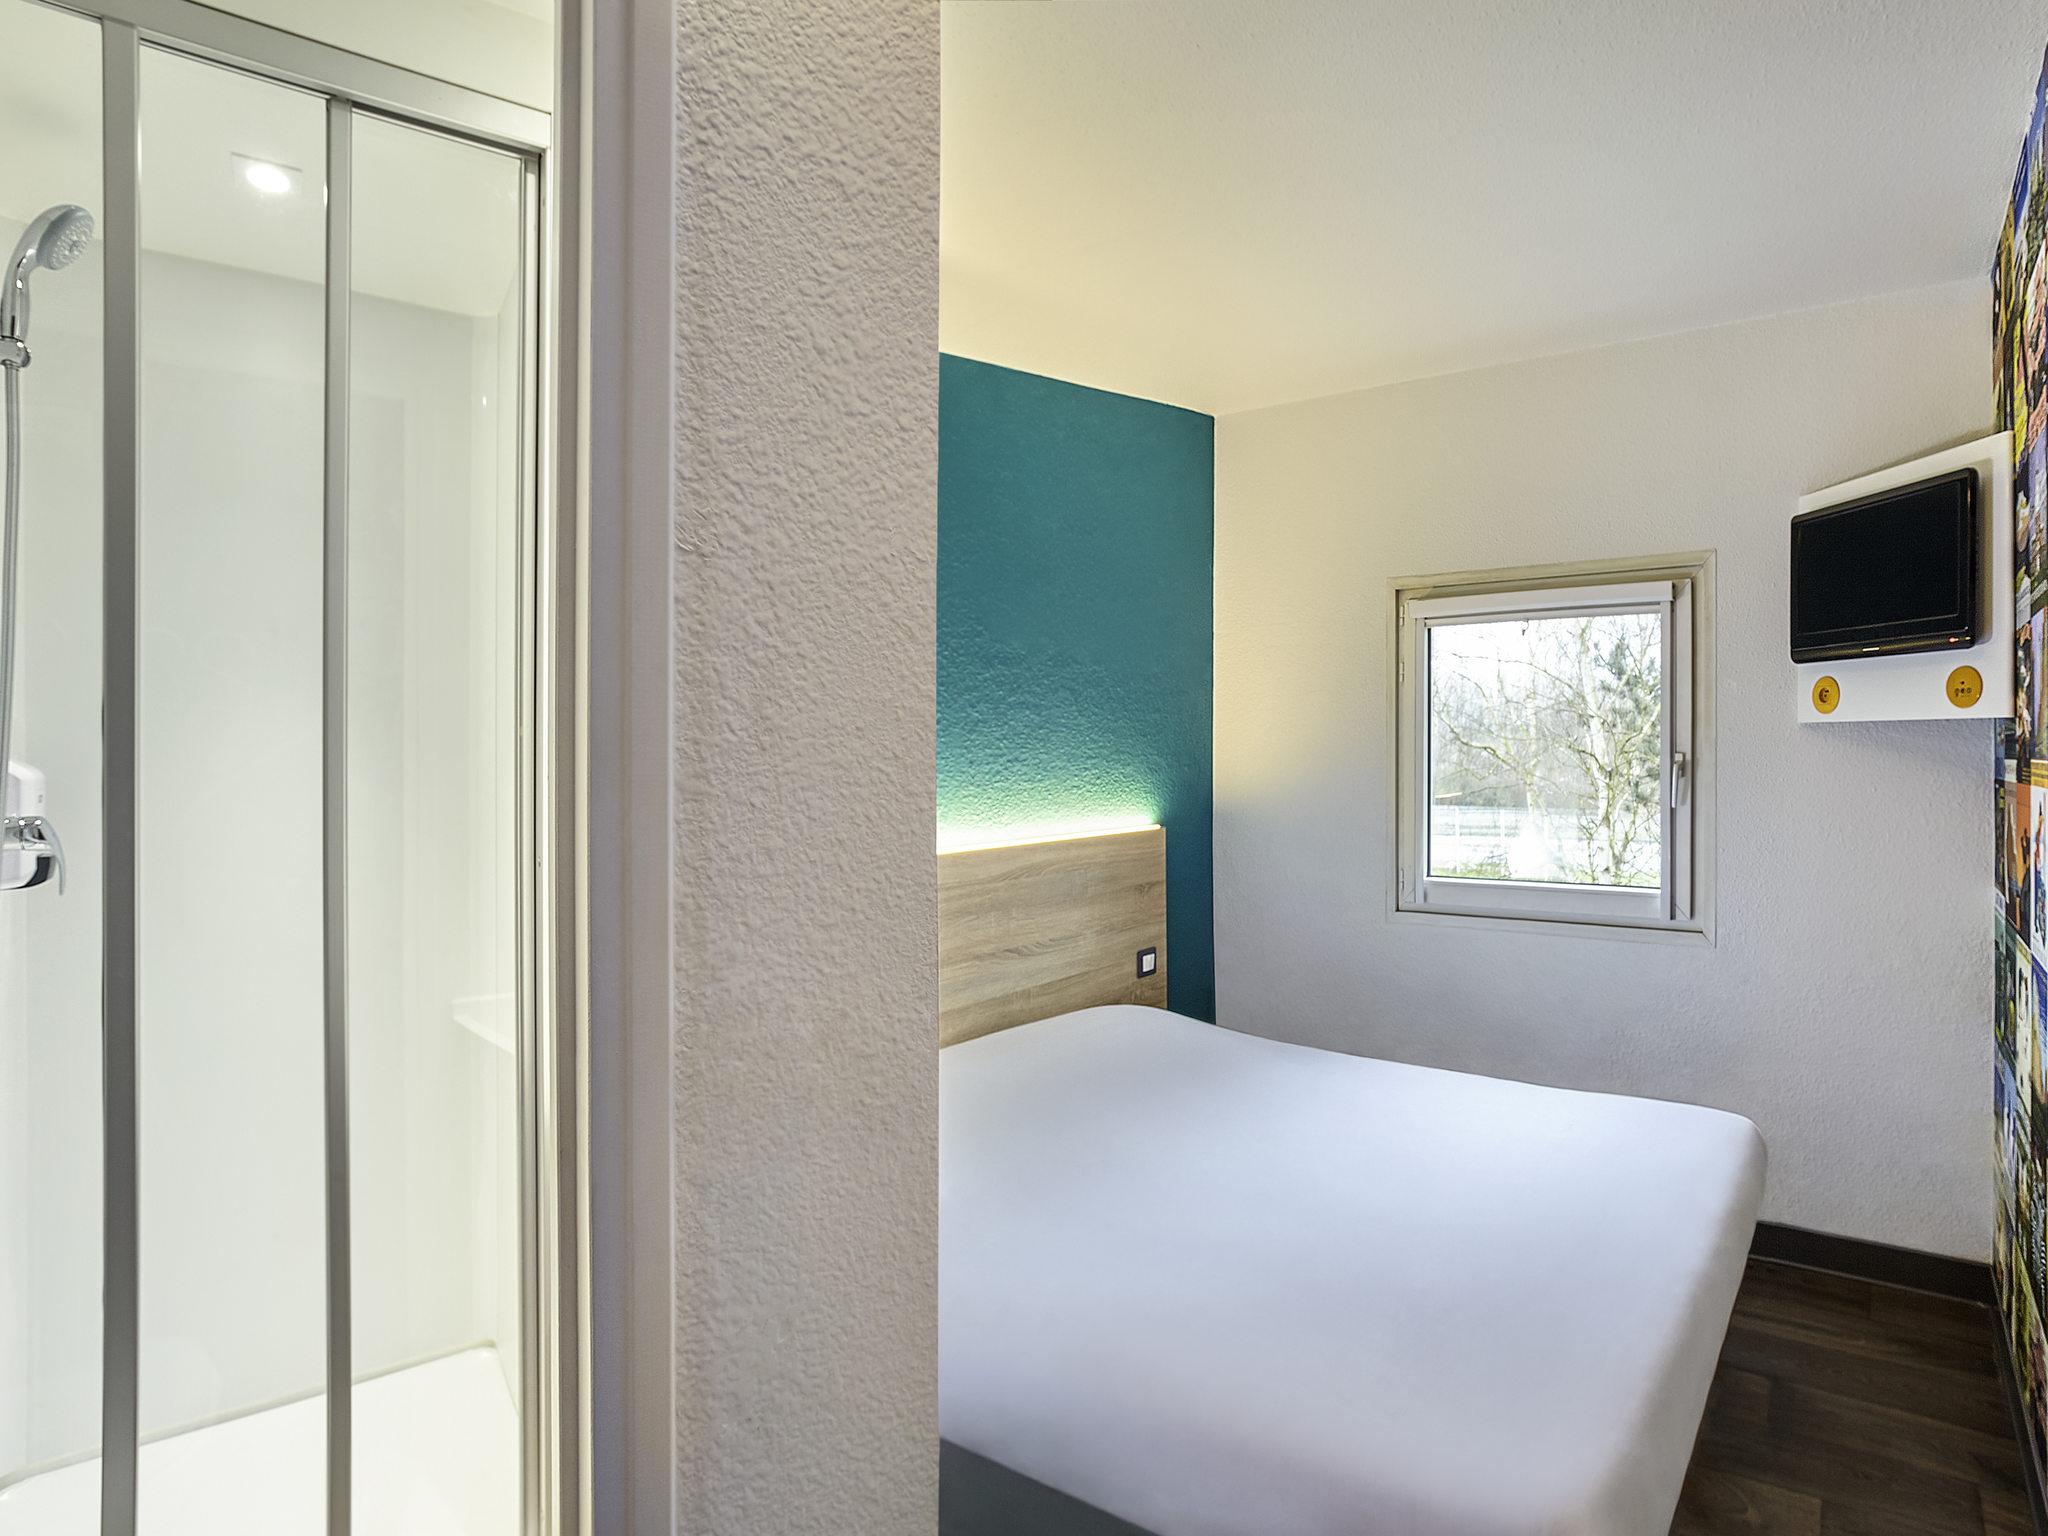 Otel – hotelF1 Lille Métropole (Métro Mons Sarts) (rénové)